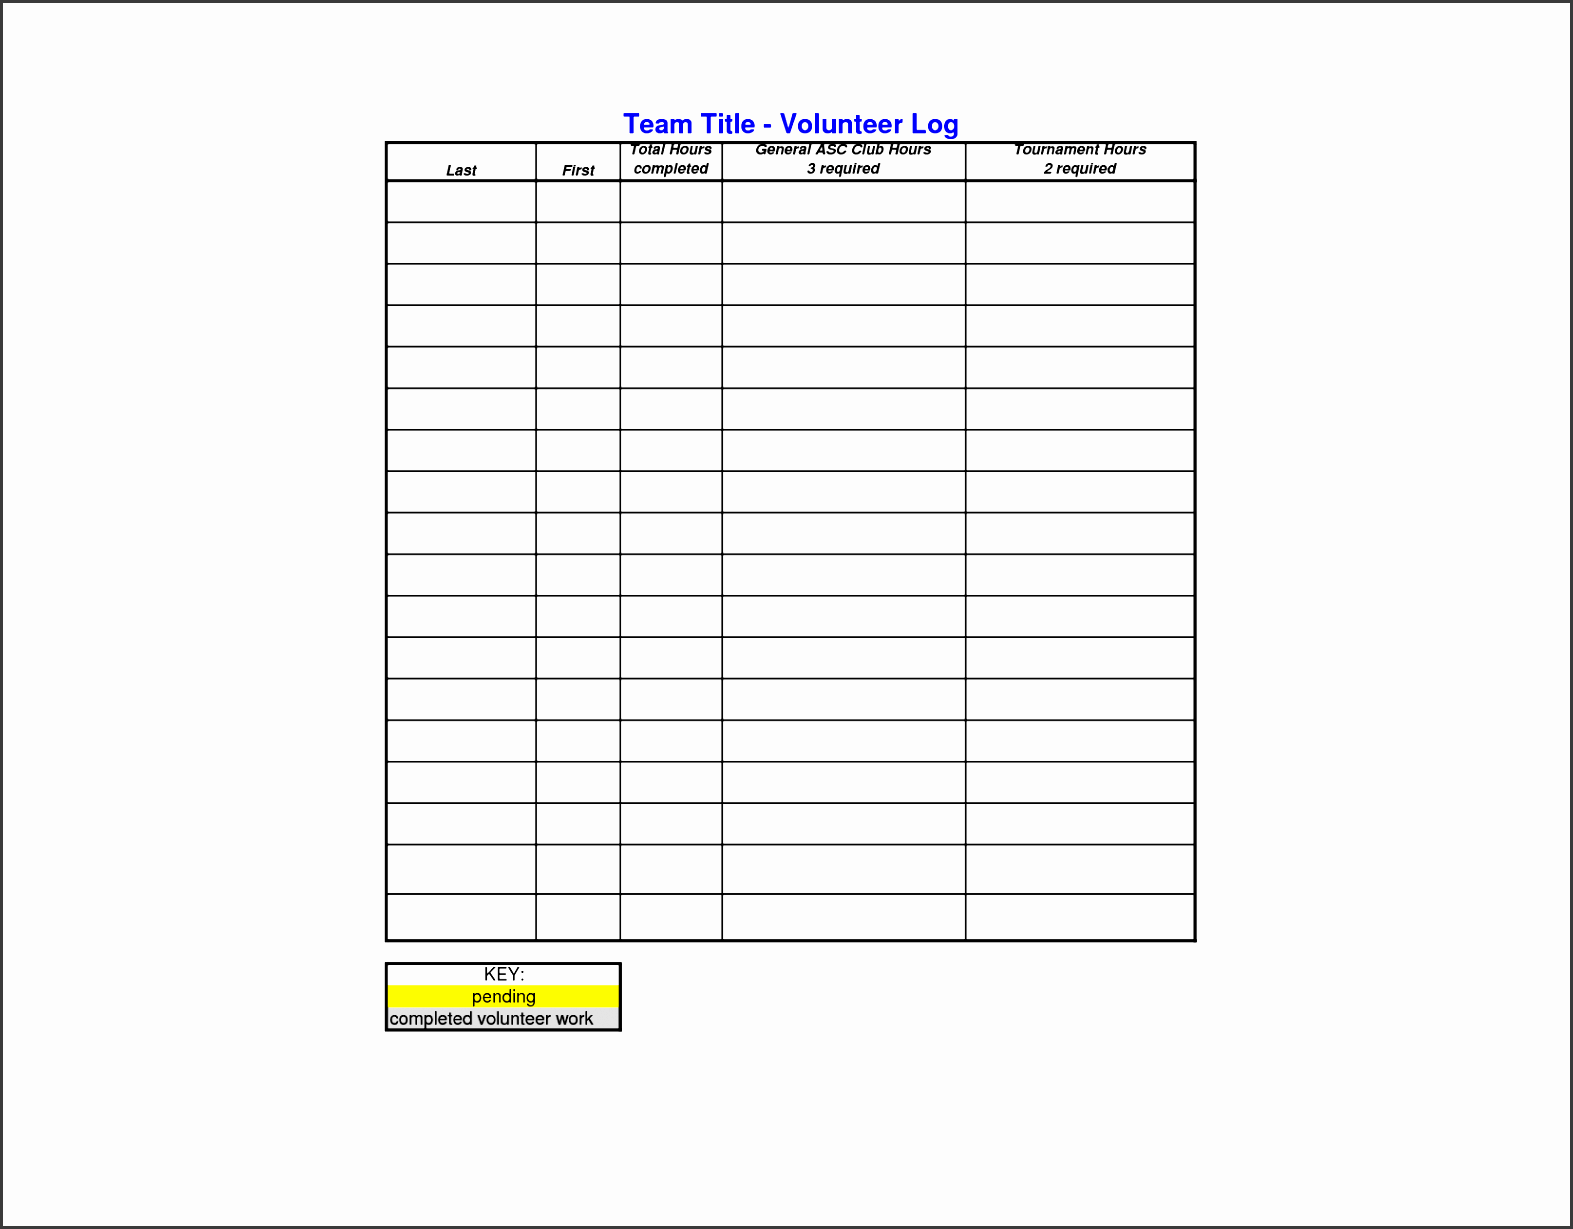 4 Online Daily Activity Log Template SampleTemplatess SampleTemplatess